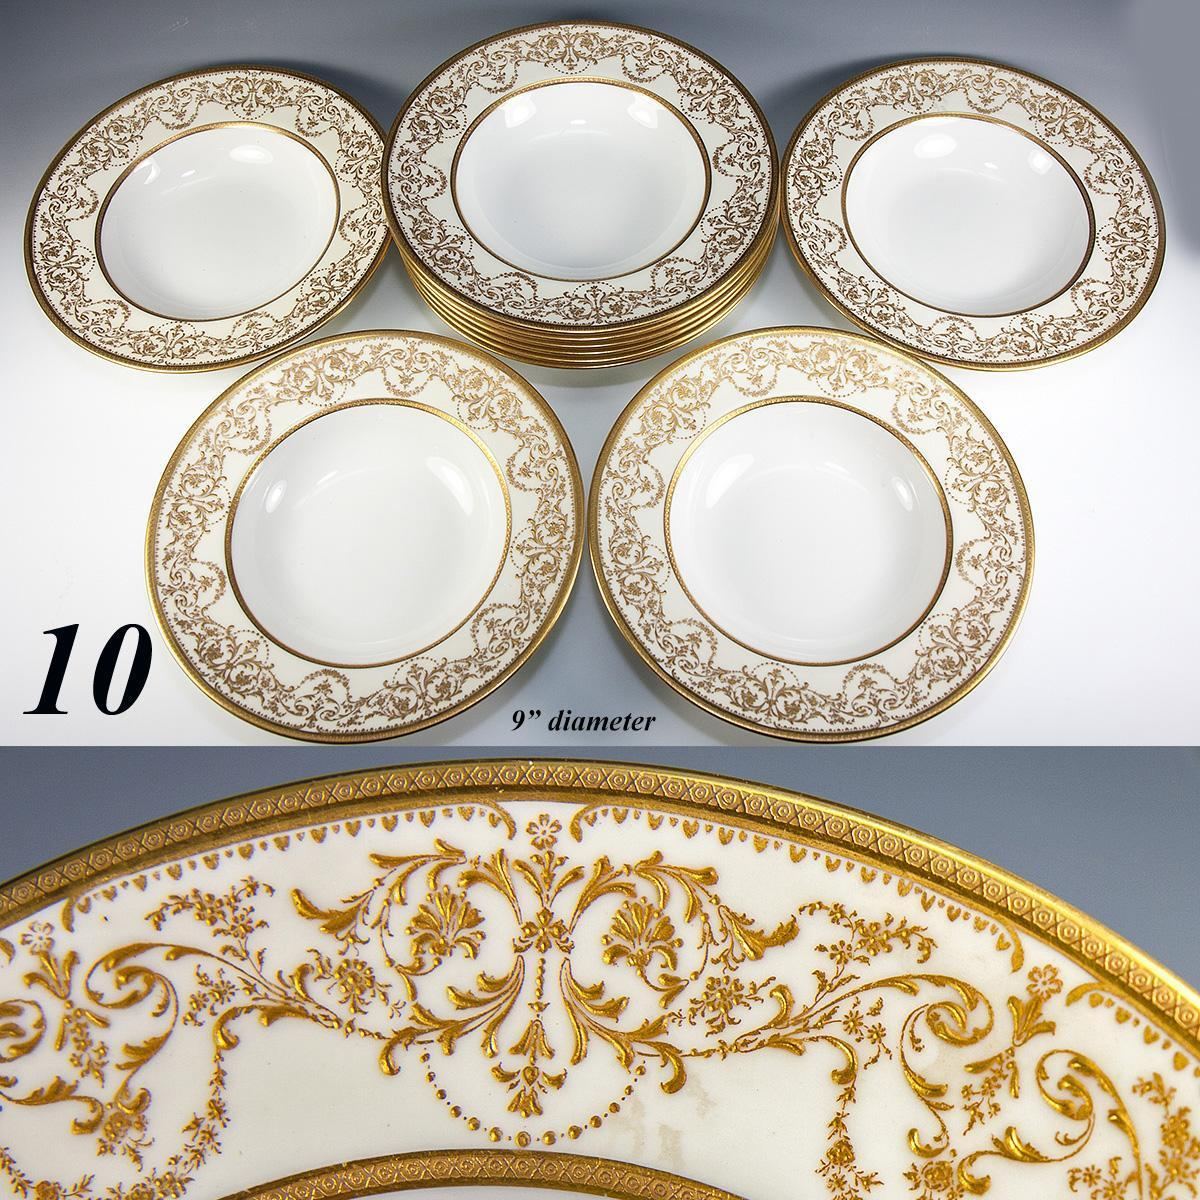 Fine Set of 10 Antique Royal Doulton Soup Plates, Raised Gold Enamel Encrusted, Belle Epoch